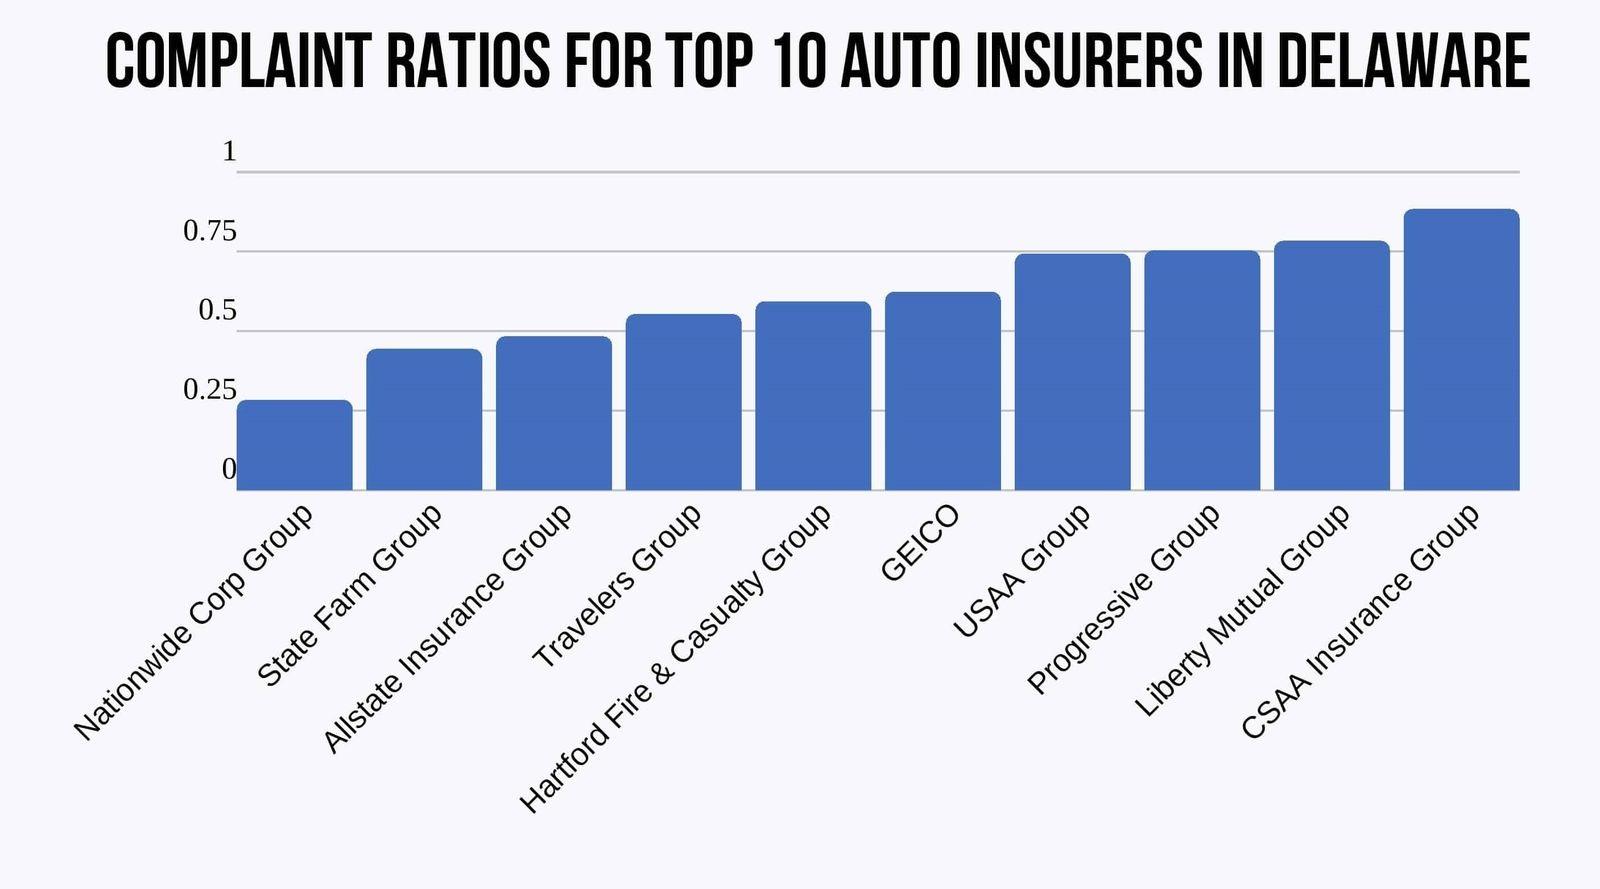 Delaware Complaint Ratios Top 10 Auto Insurers